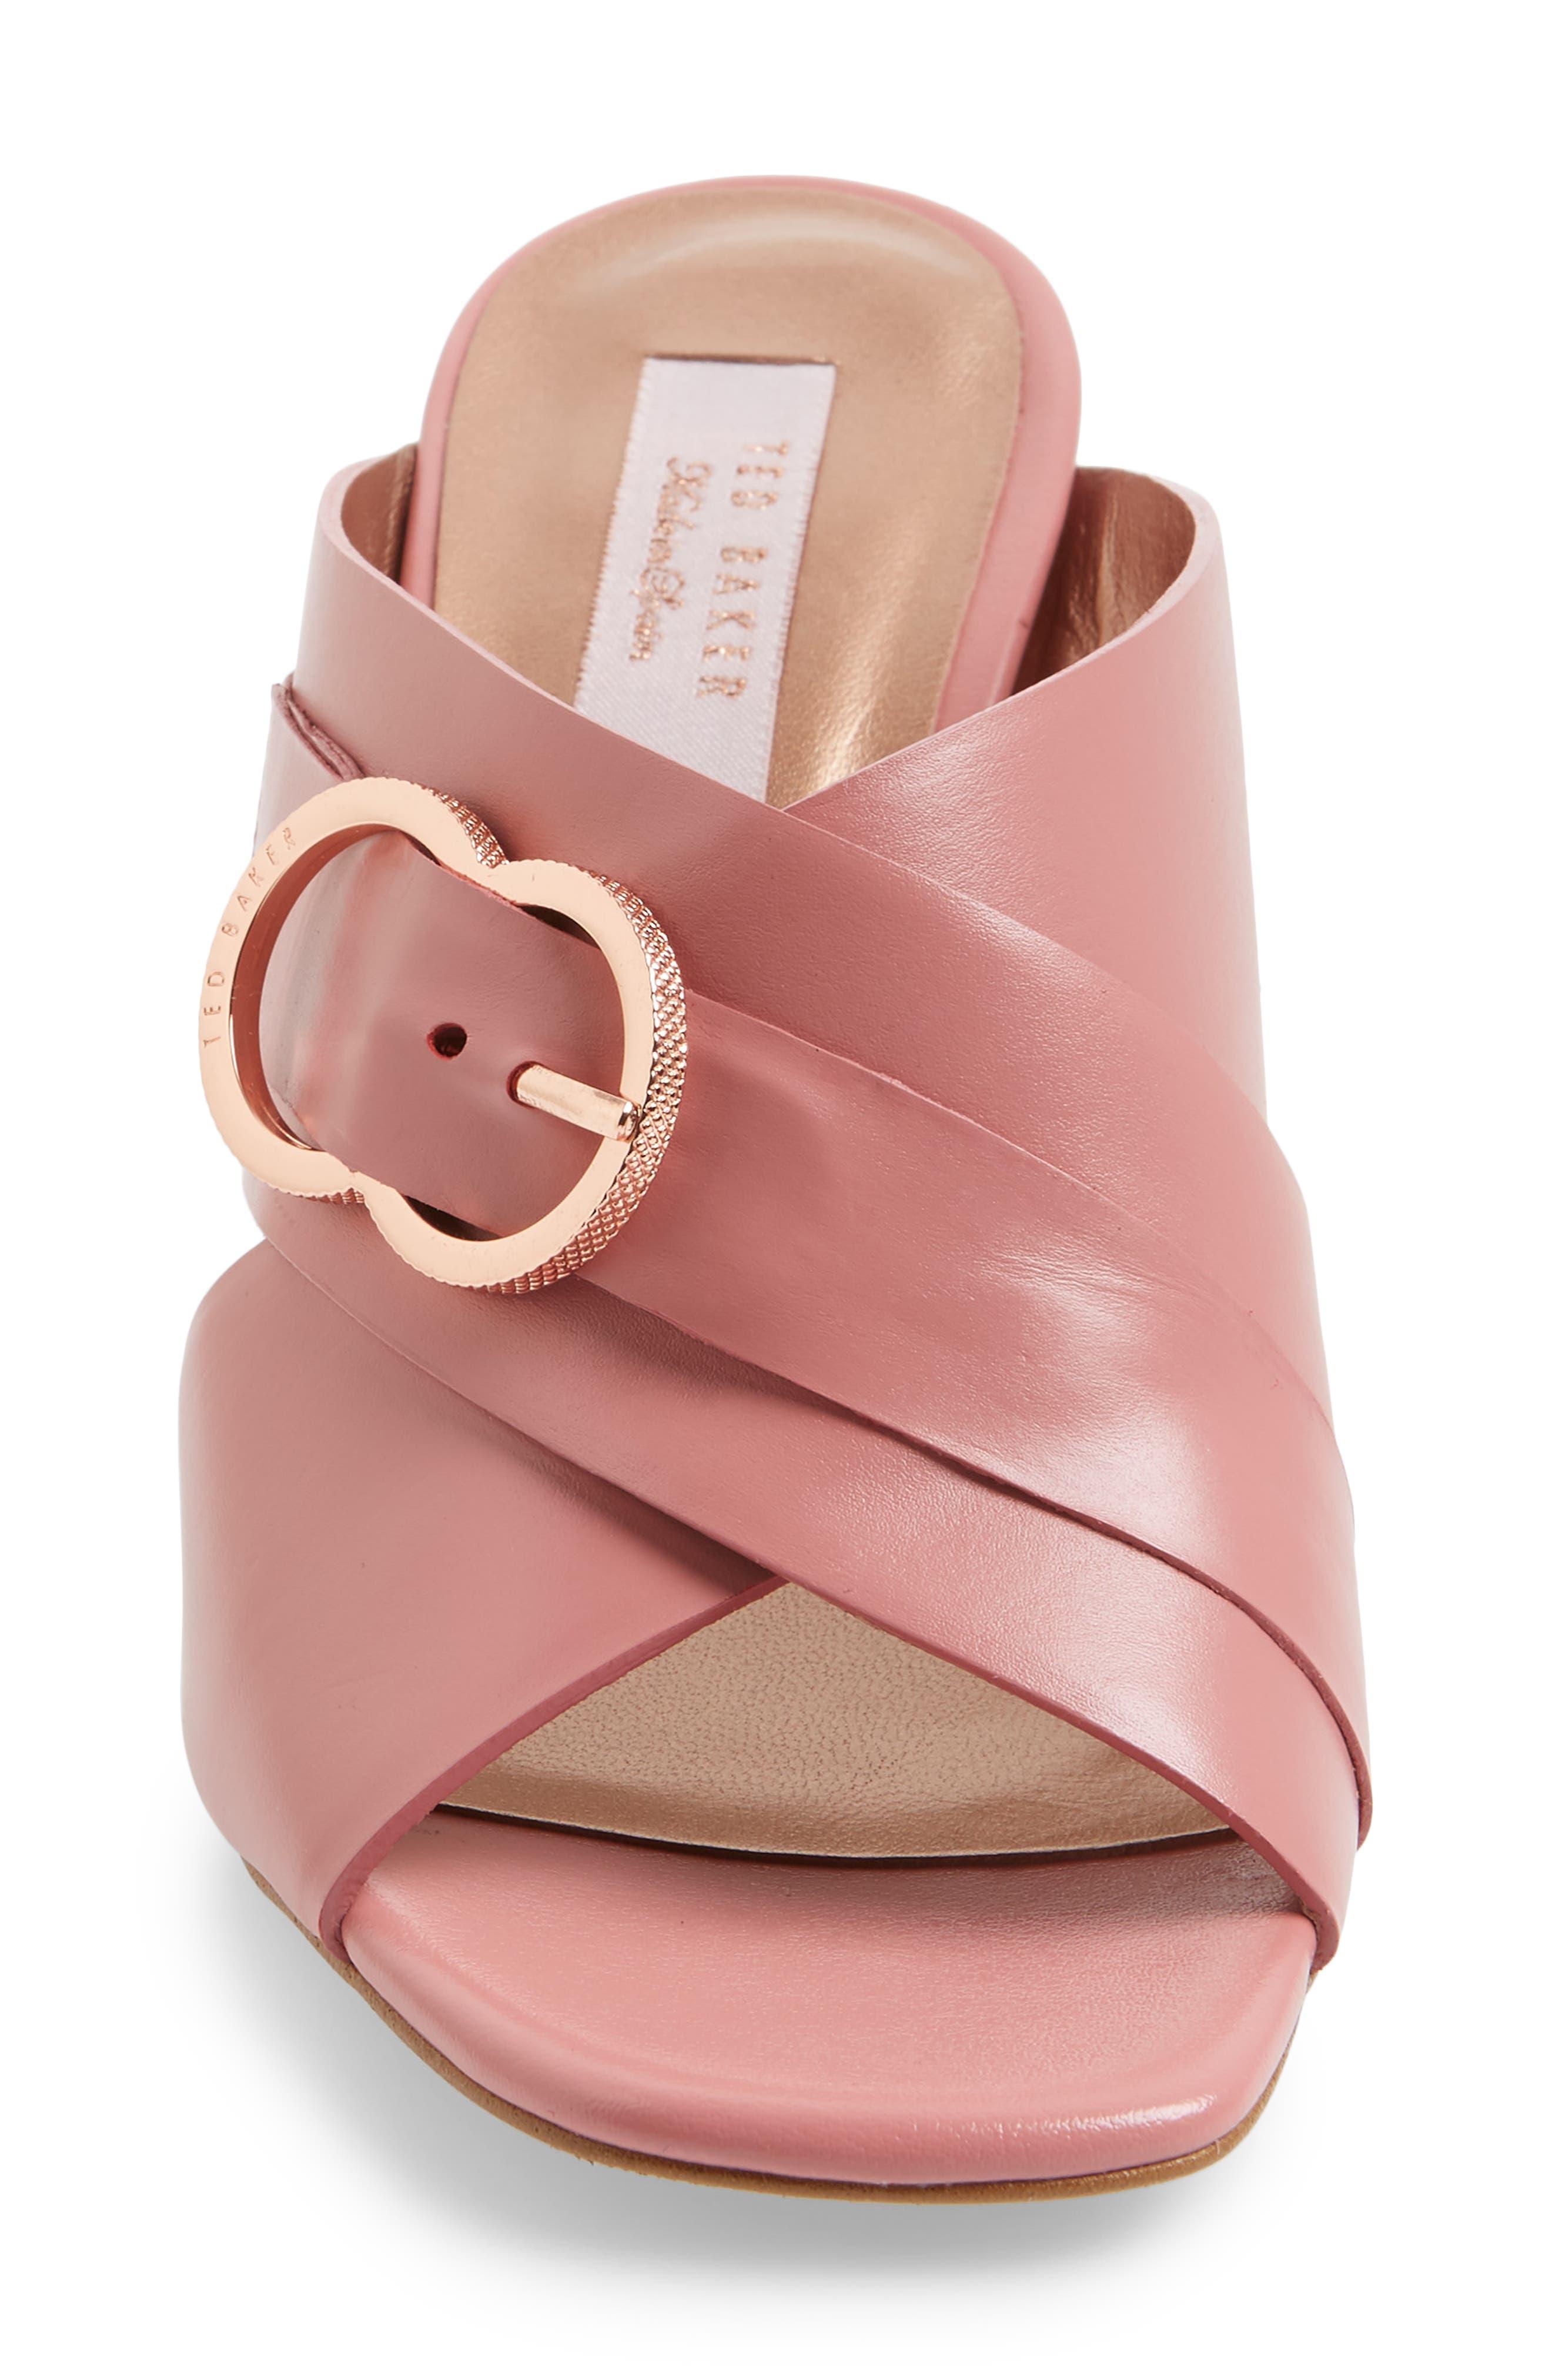 Malada Slide Sandal,                             Alternate thumbnail 4, color,                             Pink Leather